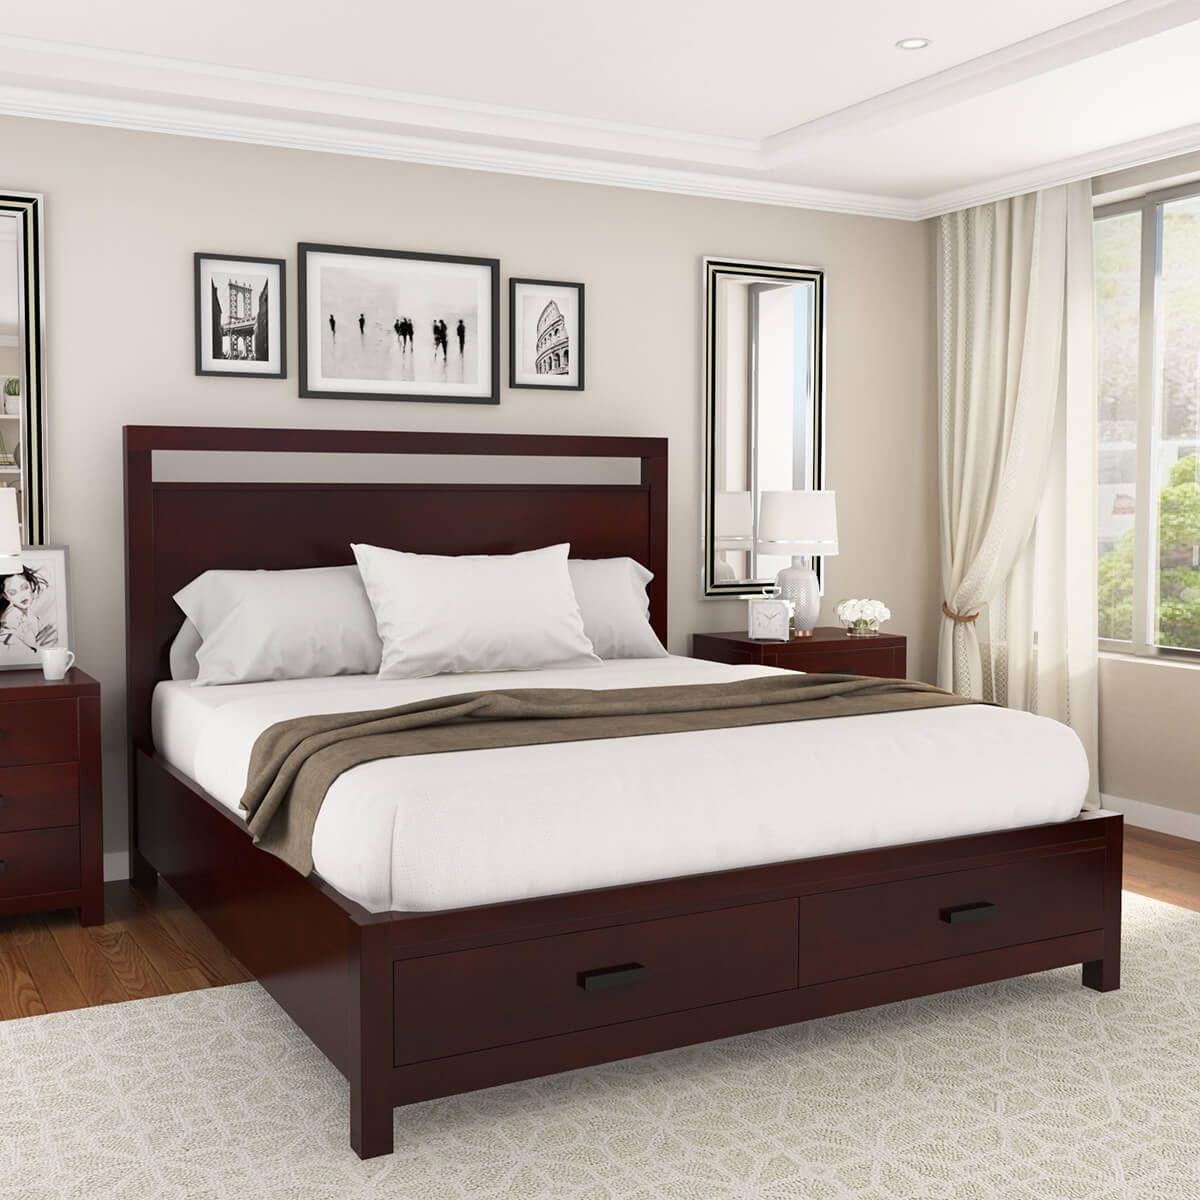 Anniston Transitional Style Solid Mahogany Wood Storage Platform Bed Bedroom Design Bedroom Sets Bedroom Interior